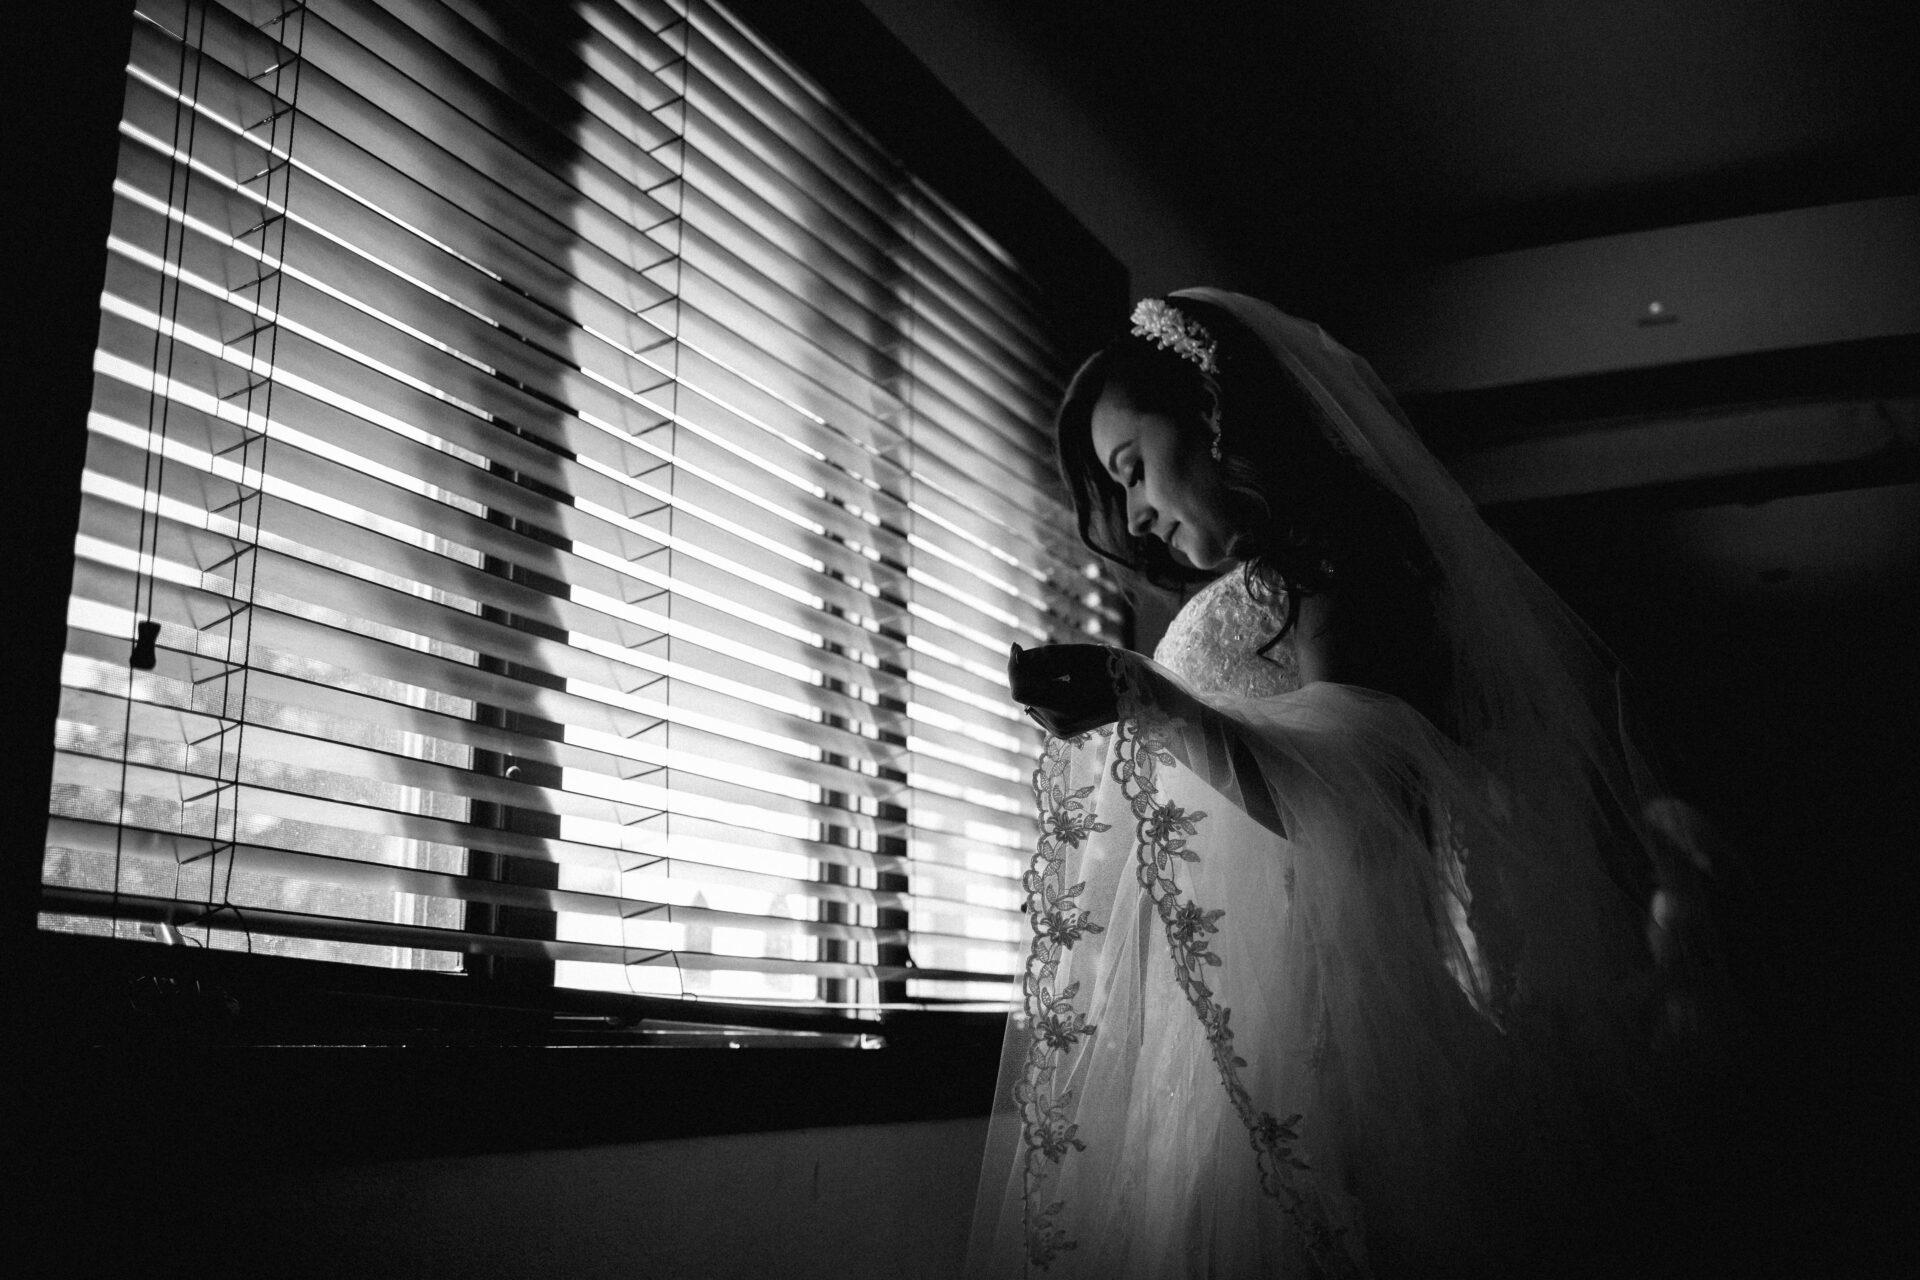 javier_noriega_fotografo_bodas_torreon_coahuila_zacatecas_wedding_photographer17a